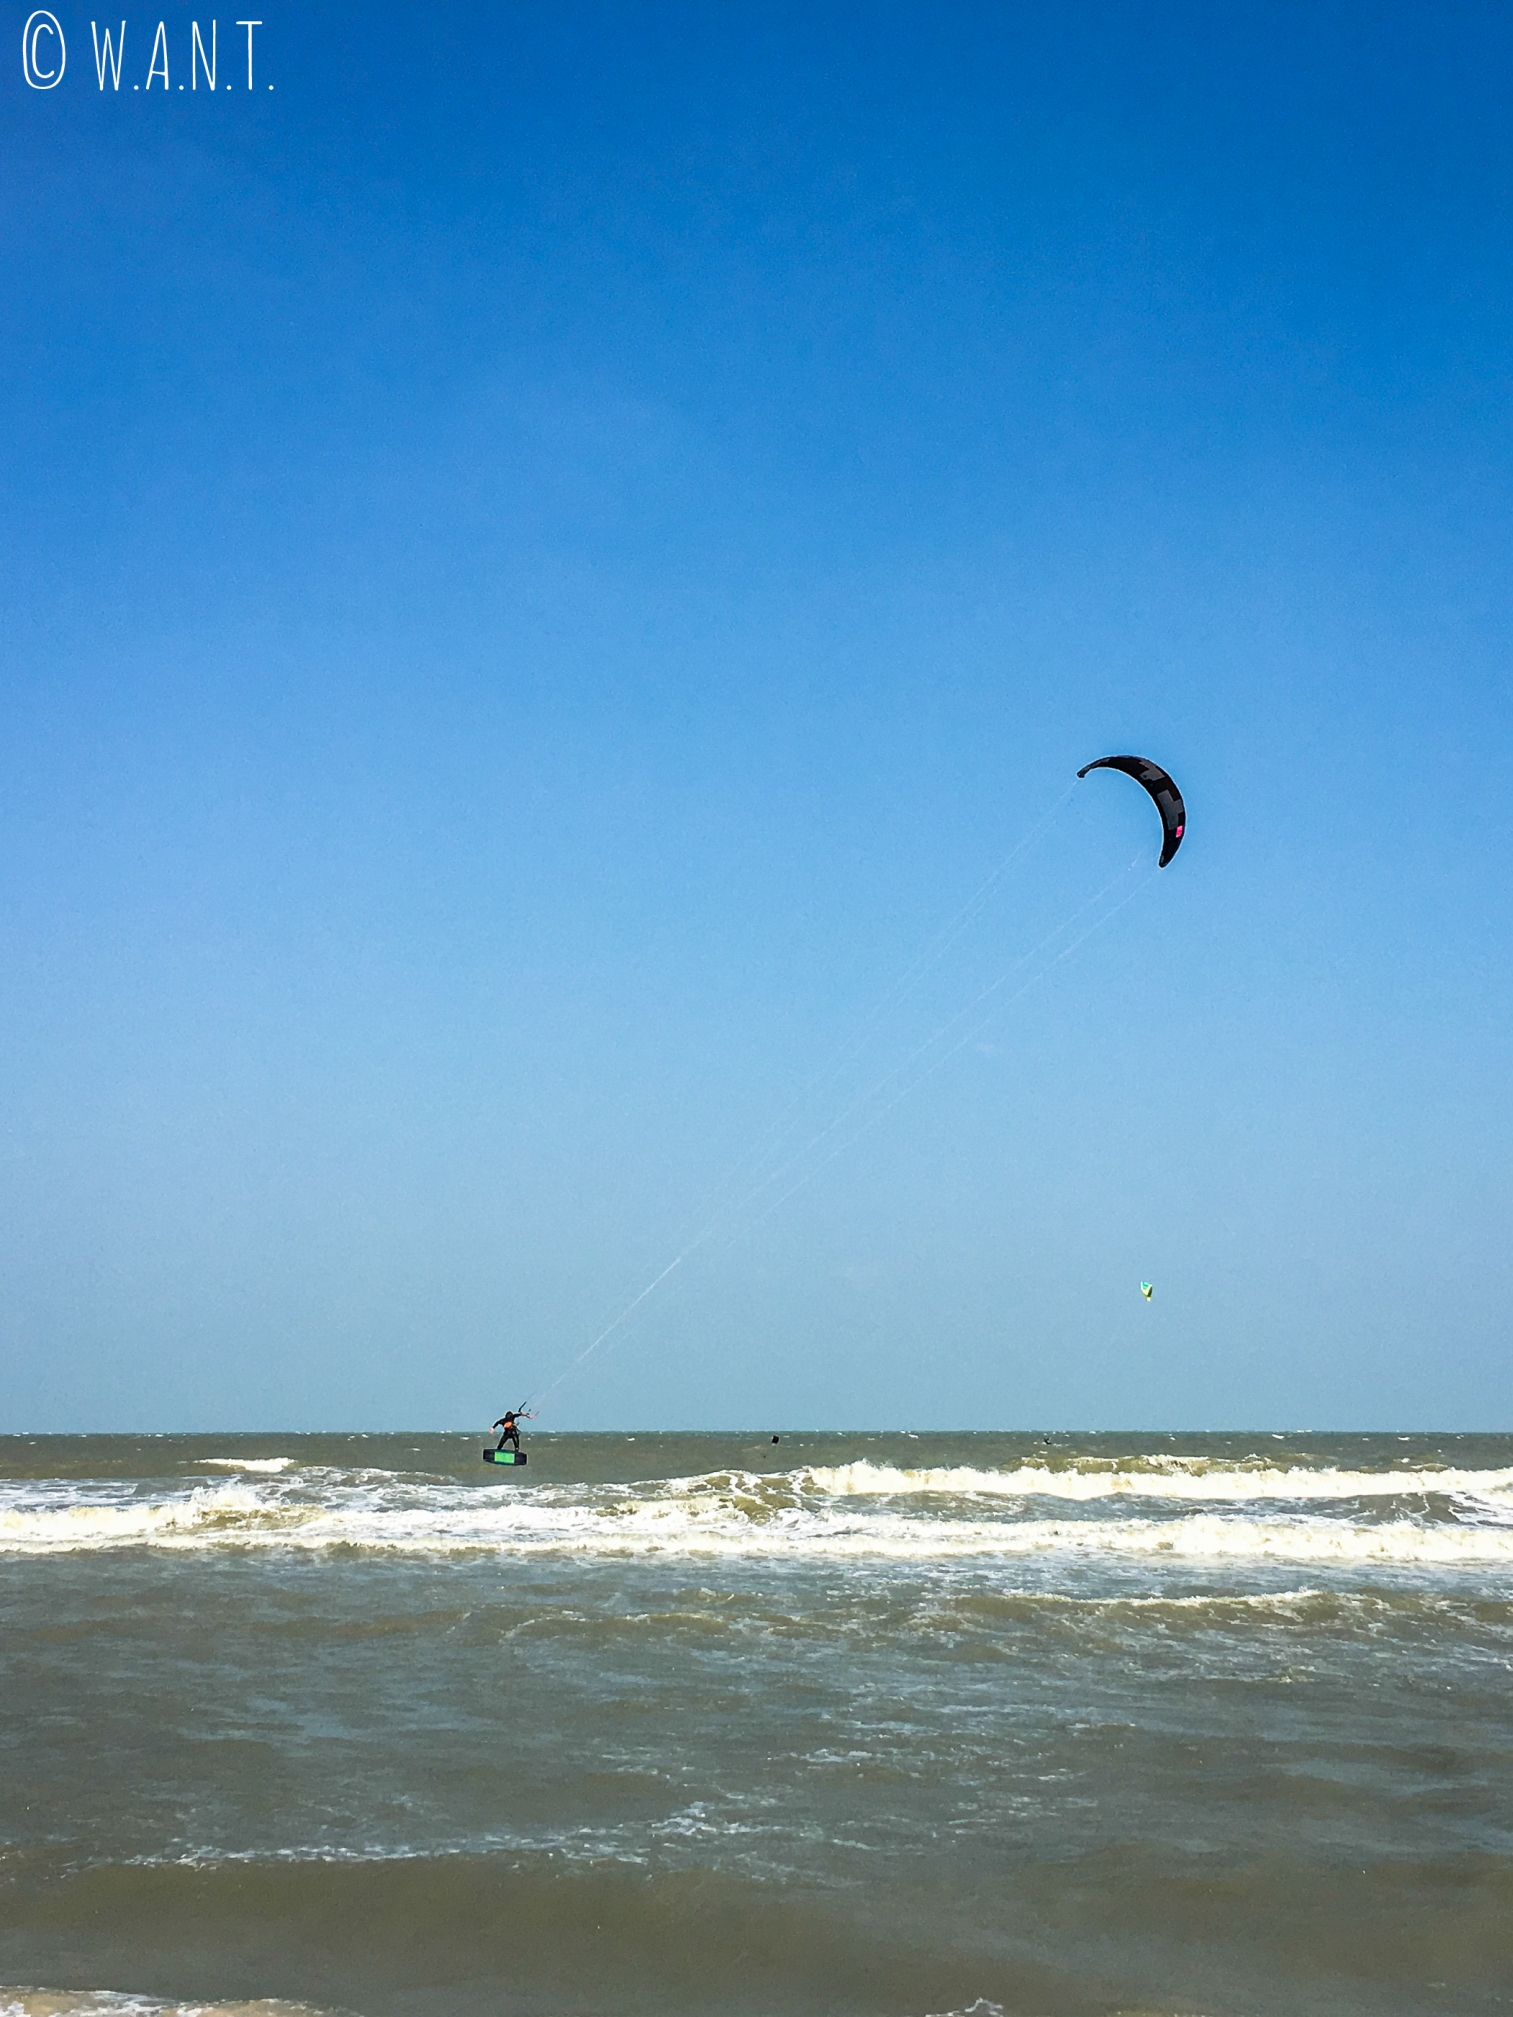 Les Kitesurfers sont de sortie à Hua Hin